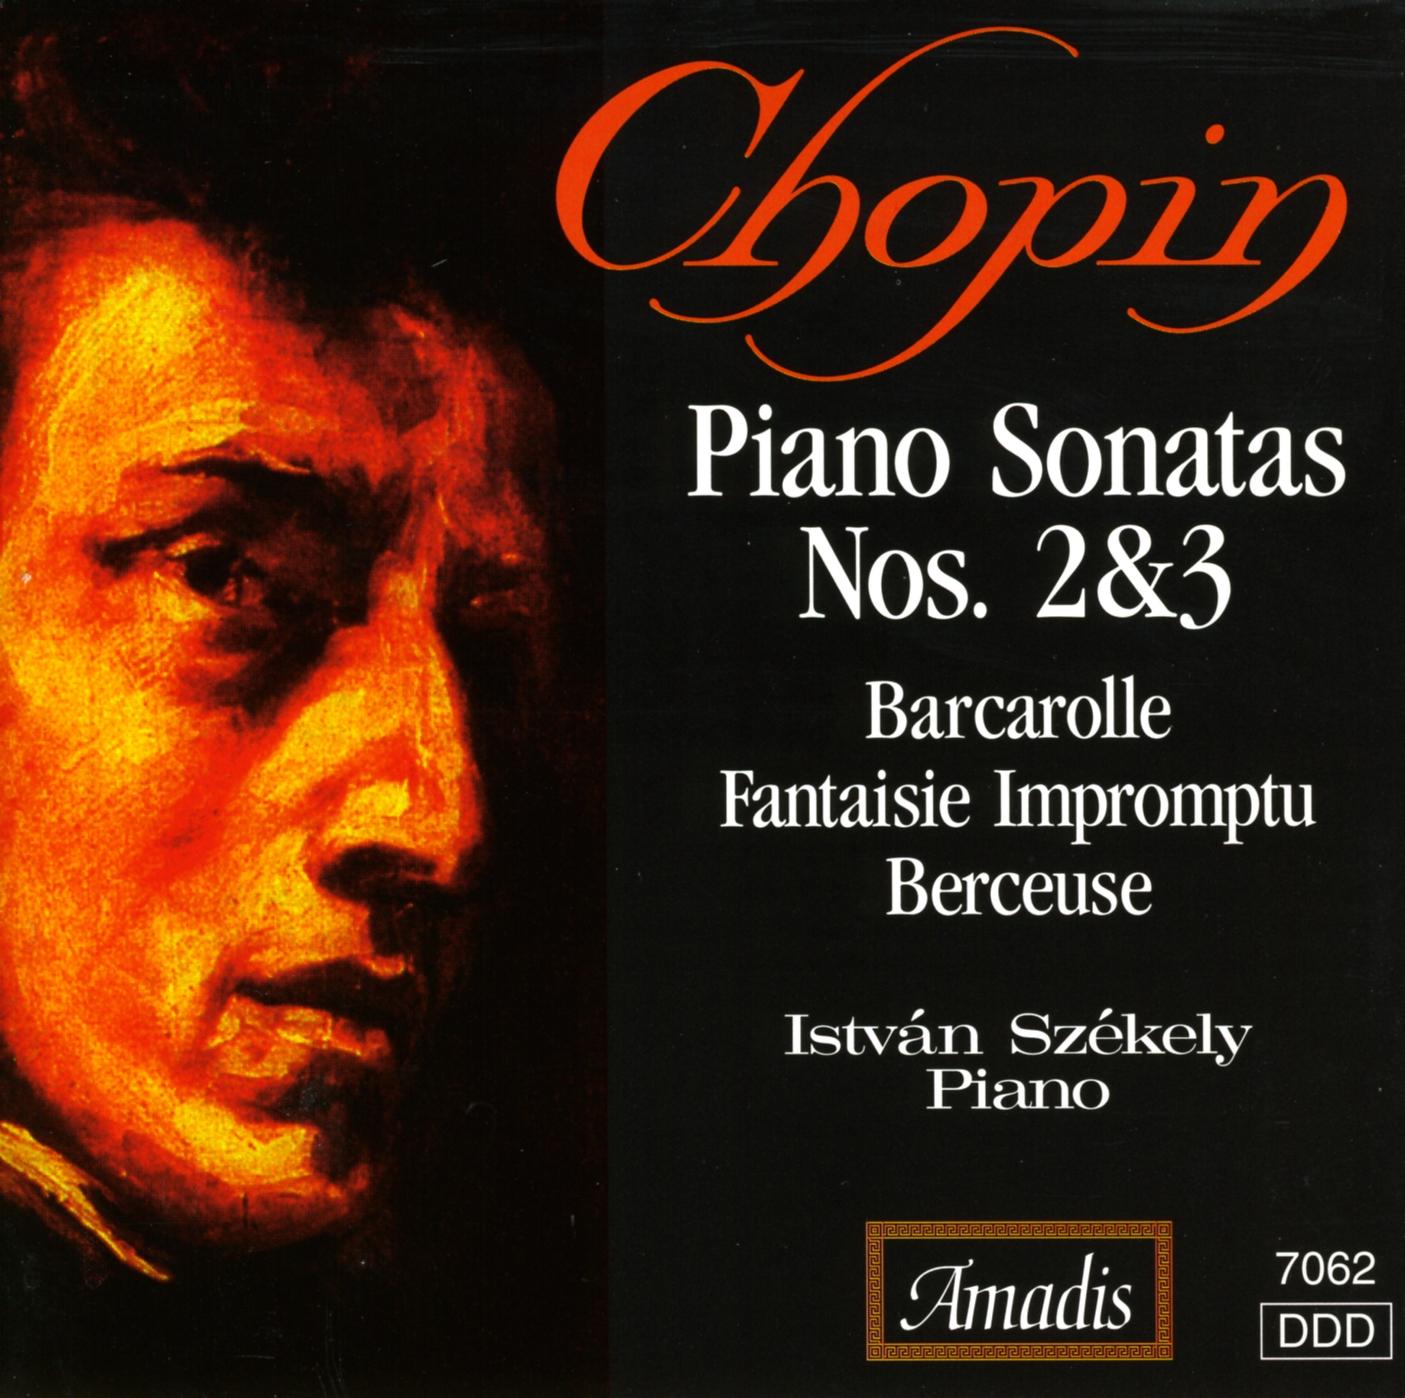 Chopin: Piano Sonatas Nos. 2 and 3 - Barcarolle in F-Sharp Major - Fantasy-Impromptu